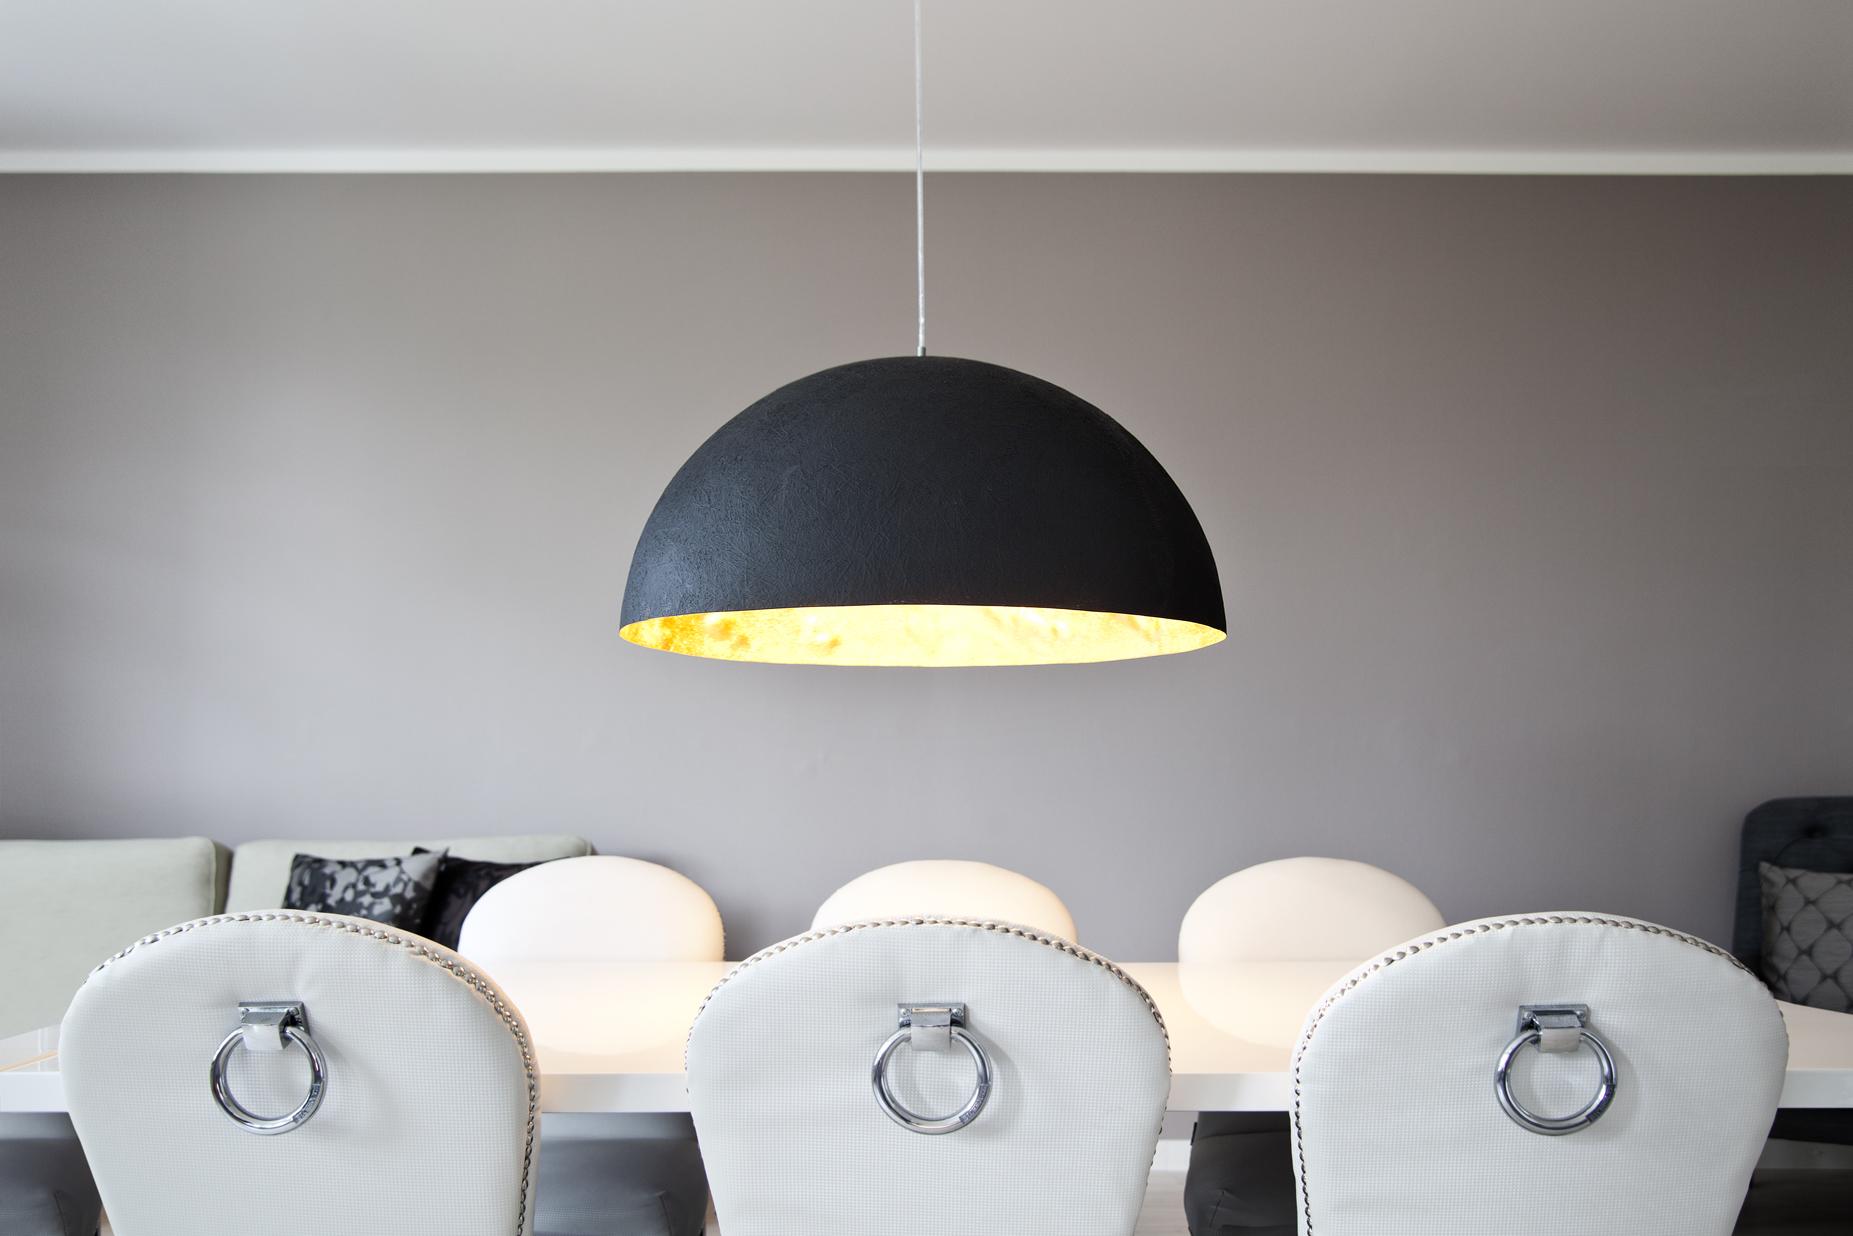 Tavoli da pranzo moderni: minimal design - Dalani e ora Westwing